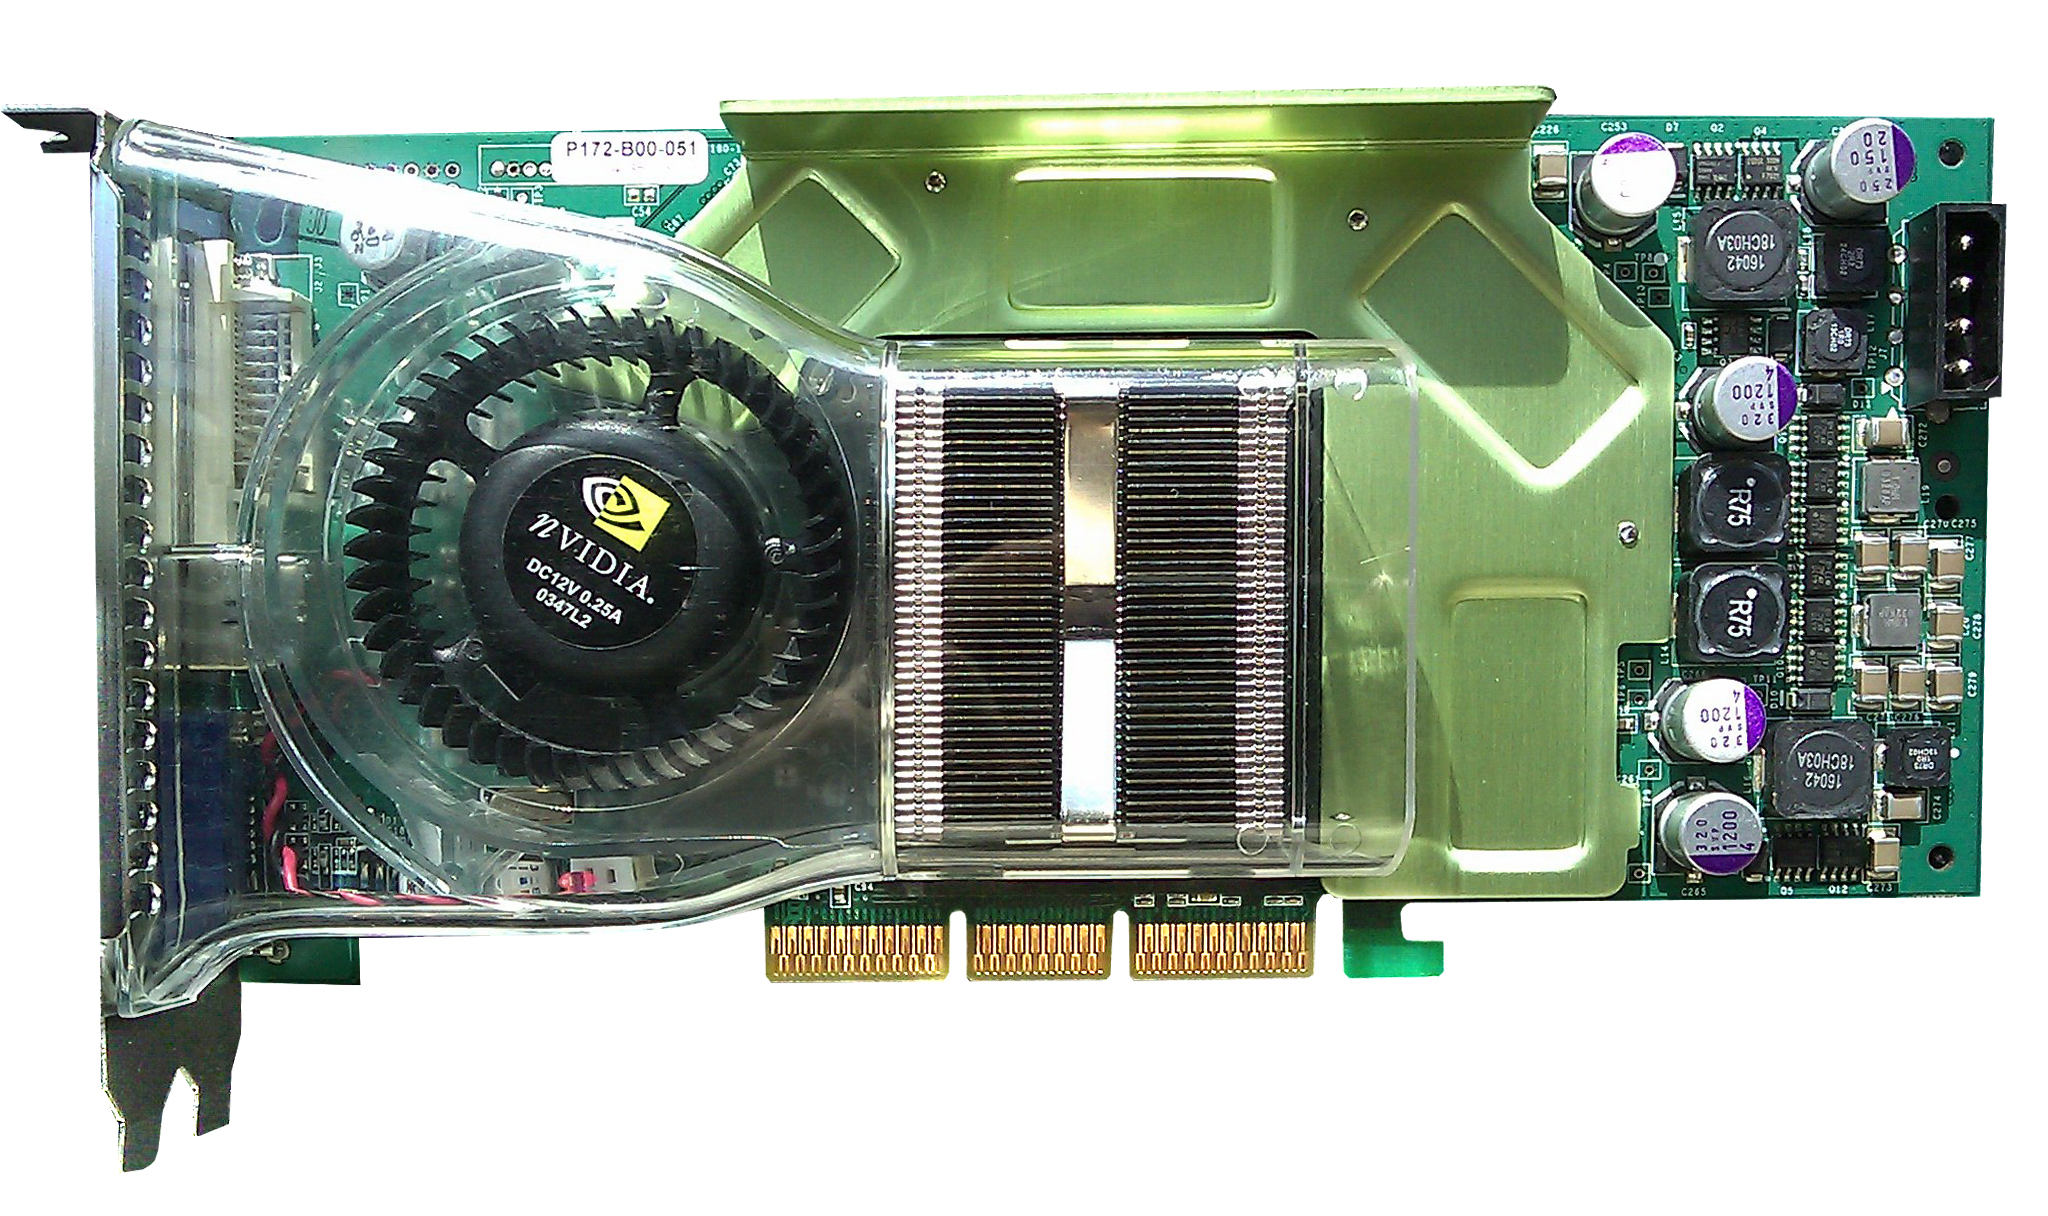 NVIDIA GEFORCE FX GO5200 32M 64M DRIVERS FOR WINDOWS MAC